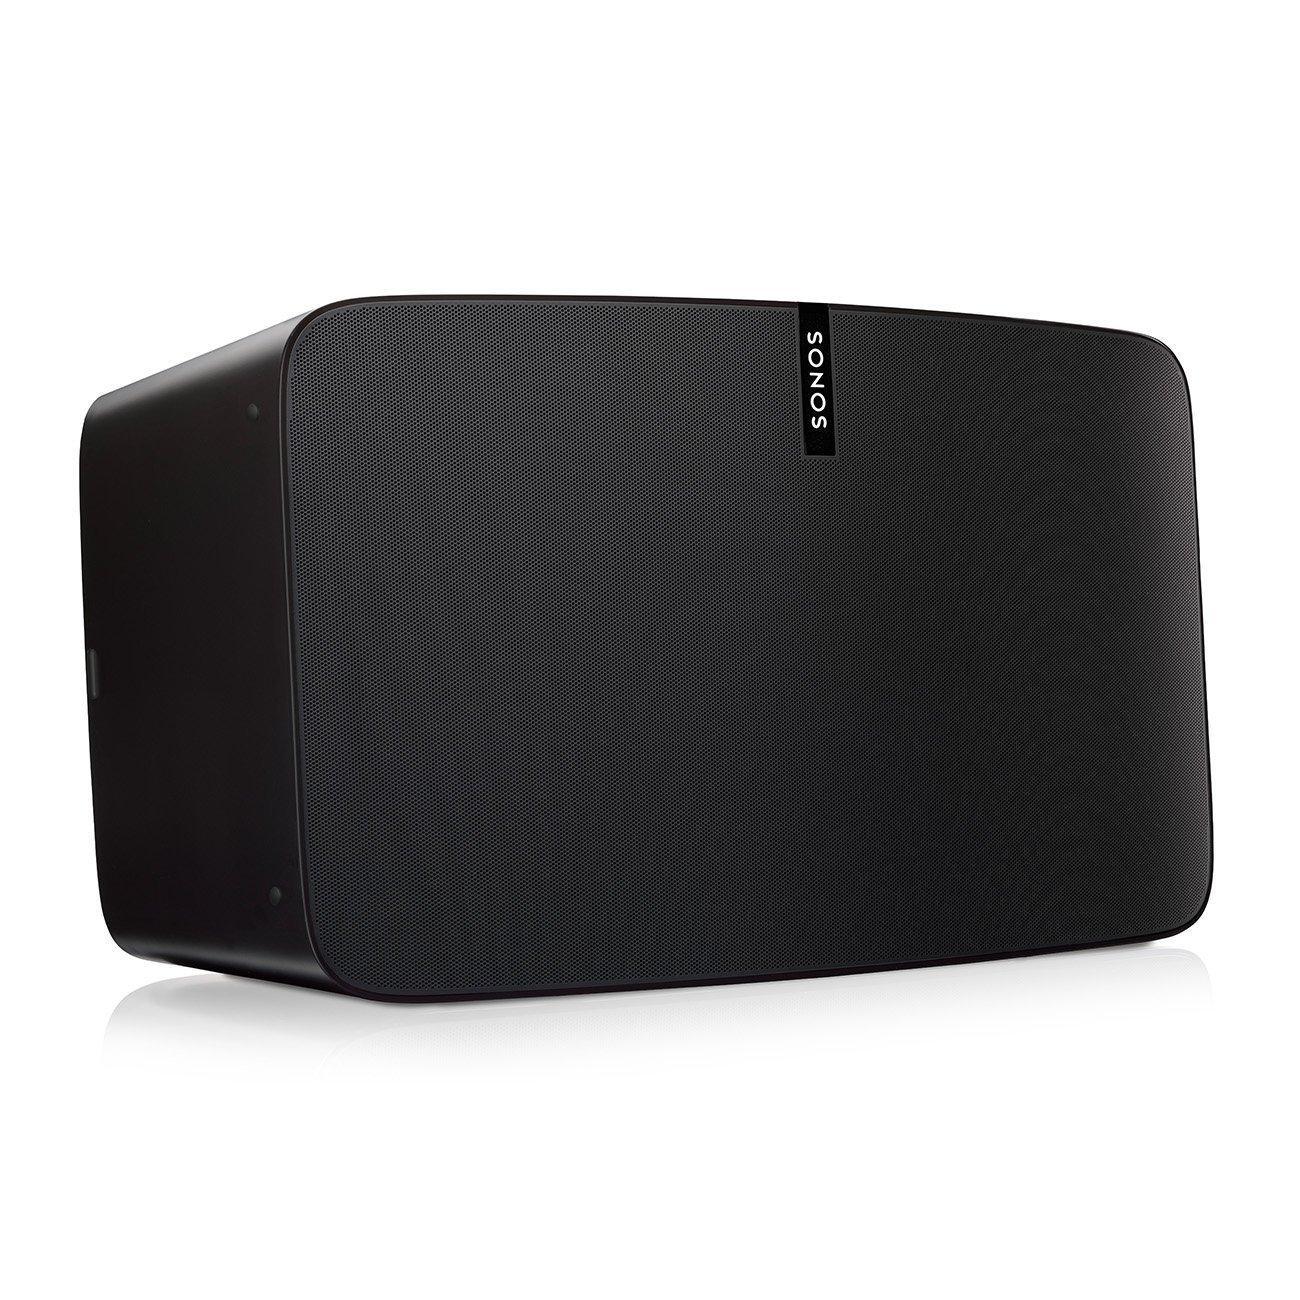 Sonos tarjous – Internet ja tietokoneet